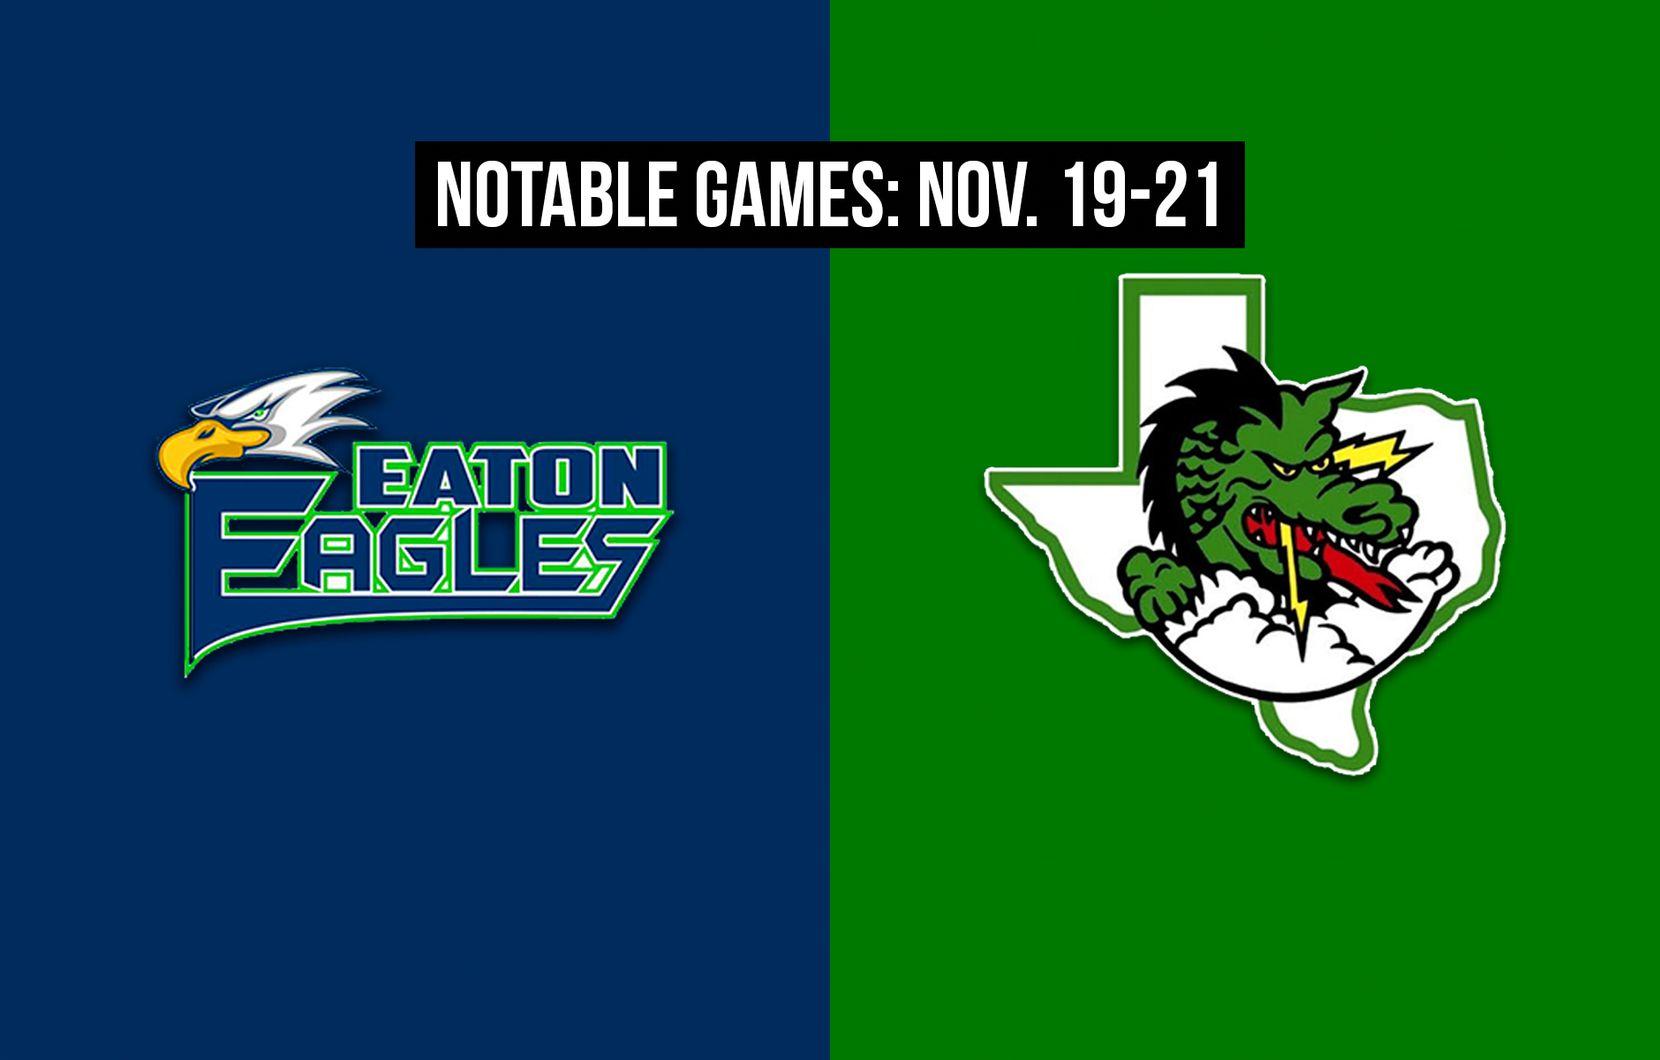 Notable games for the week of Nov. 19-21 of the 2020 season: Northwest Eaton vs. Southlake Carroll.